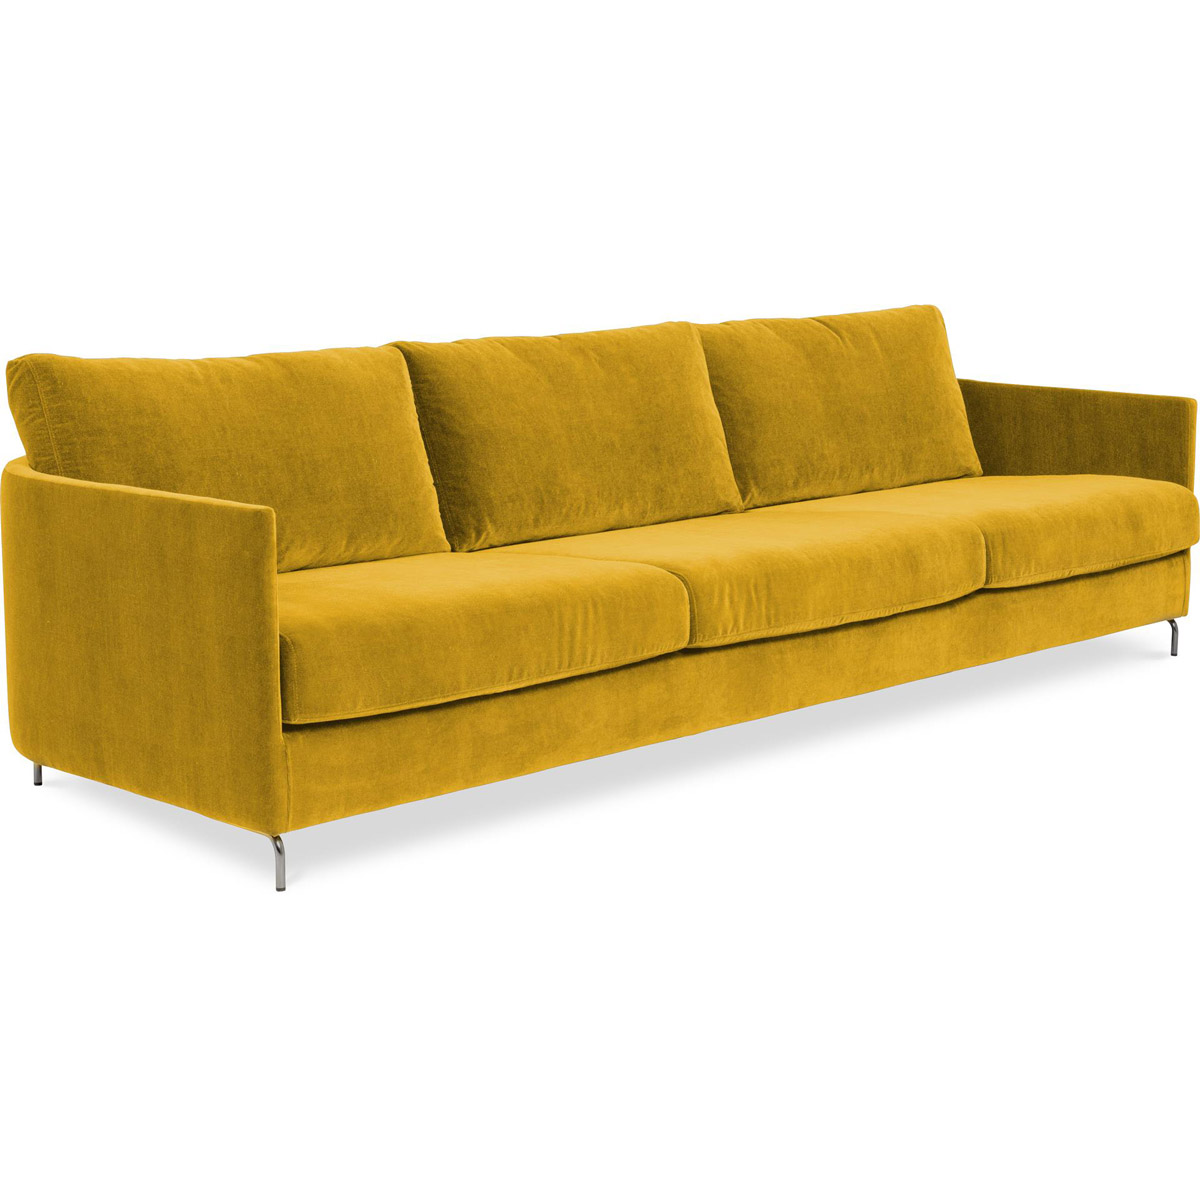 Harmony soffa Day 4-sits Azure 18 Yellow